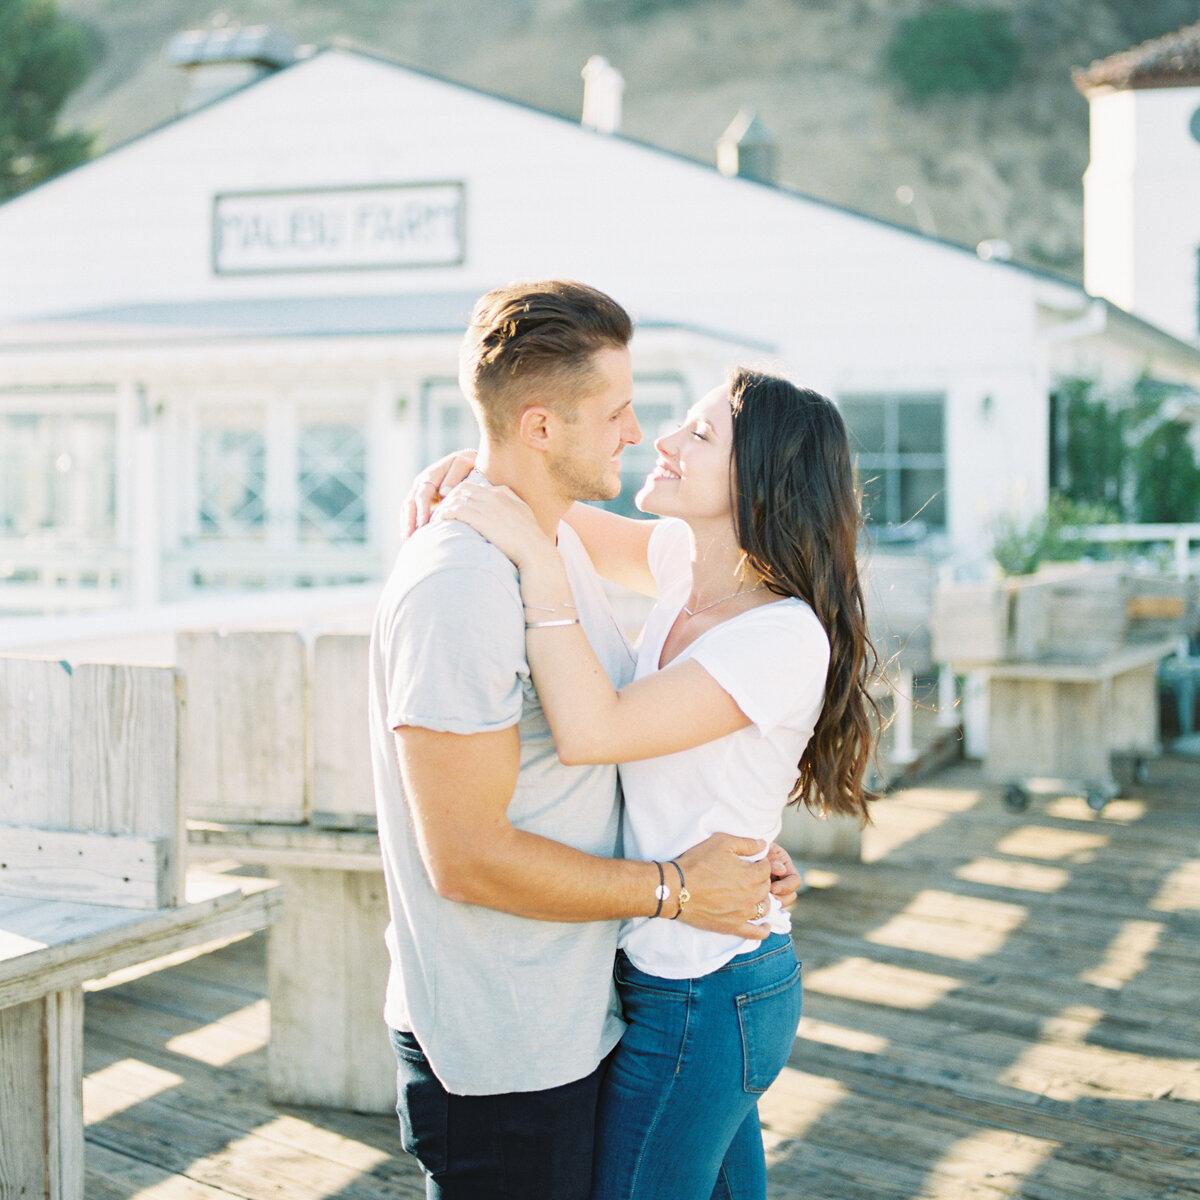 Malibu_Farm_Engagement_Photos_Anya_Kernes_Photography_A&B-2.jpg